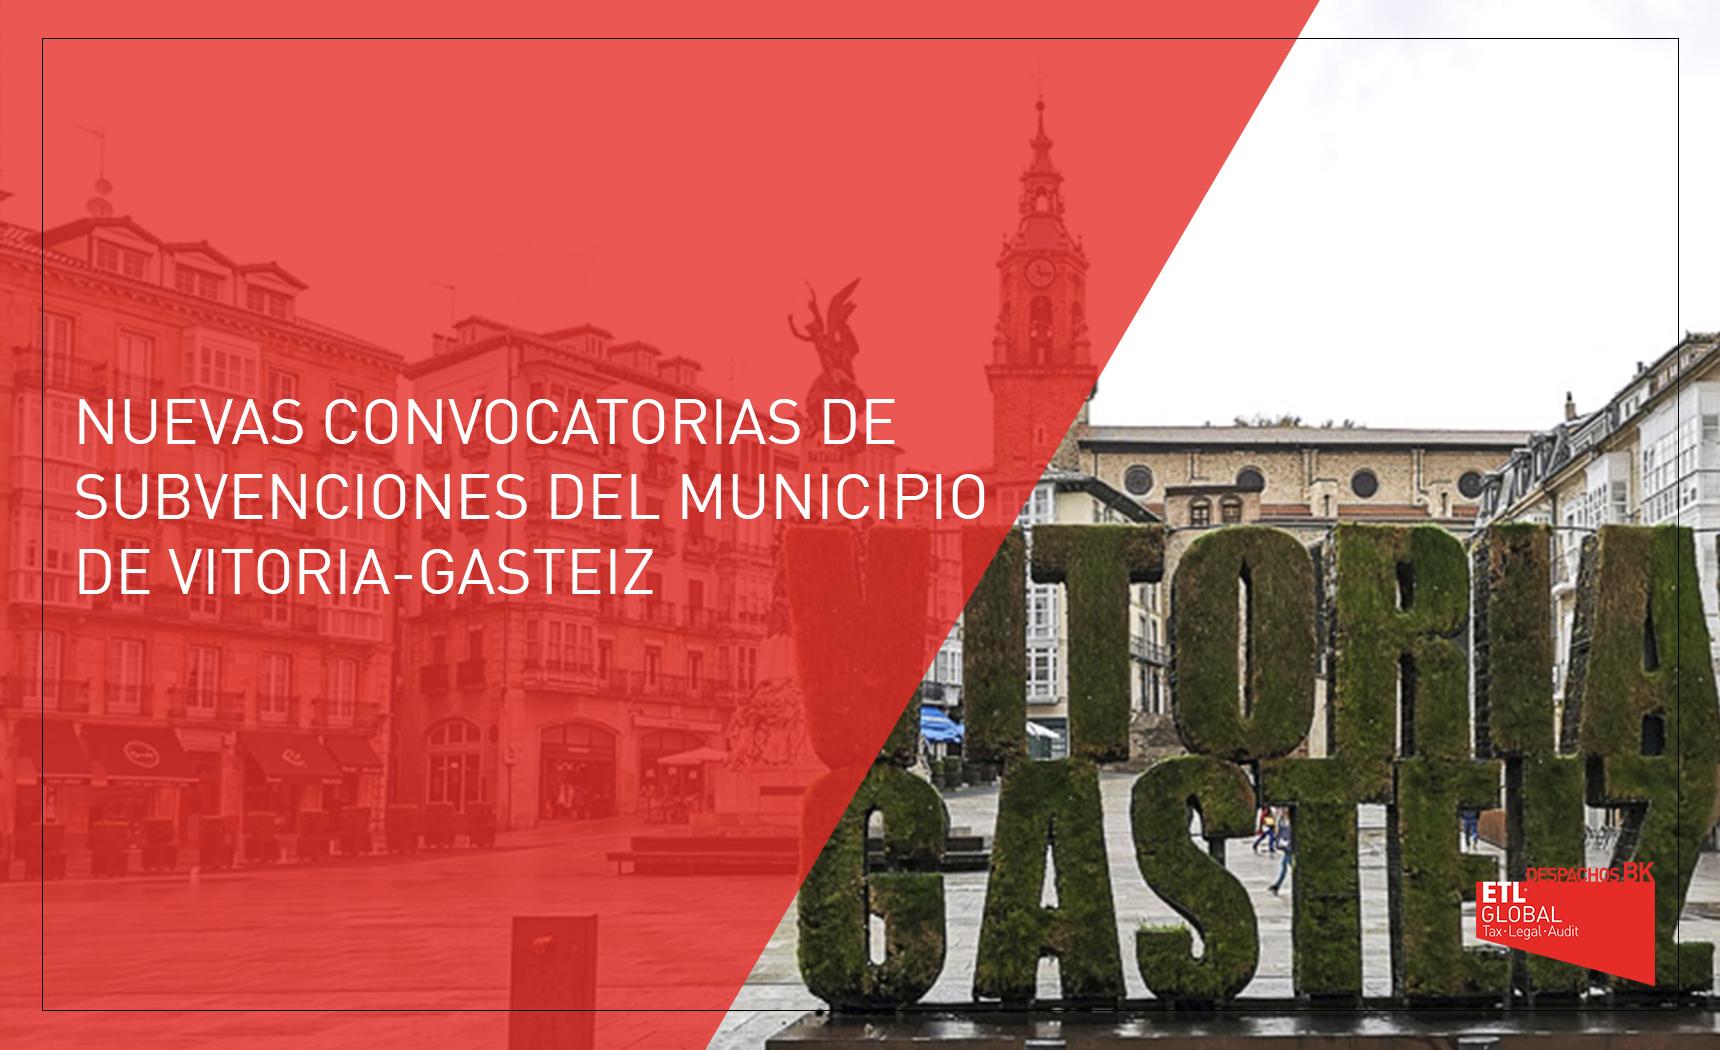 ayudas Vitoria-Gasteiz